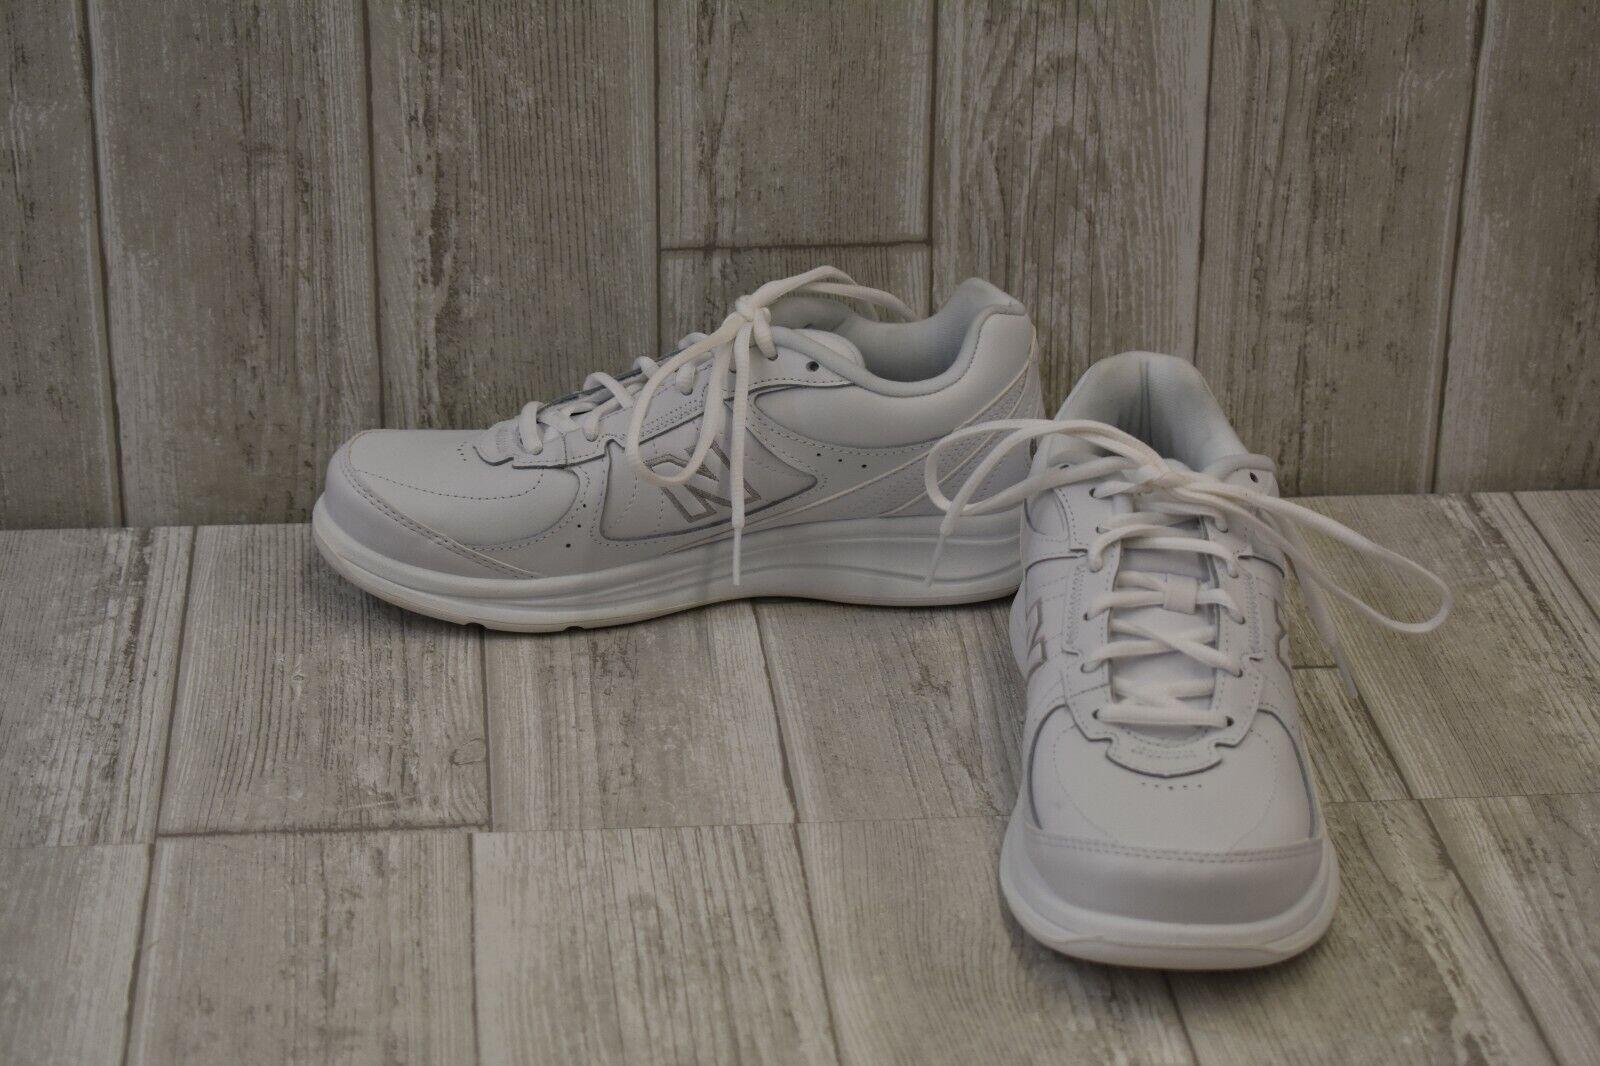 New Balance WW577WT Walking shoes - Women's Size 9 B - White